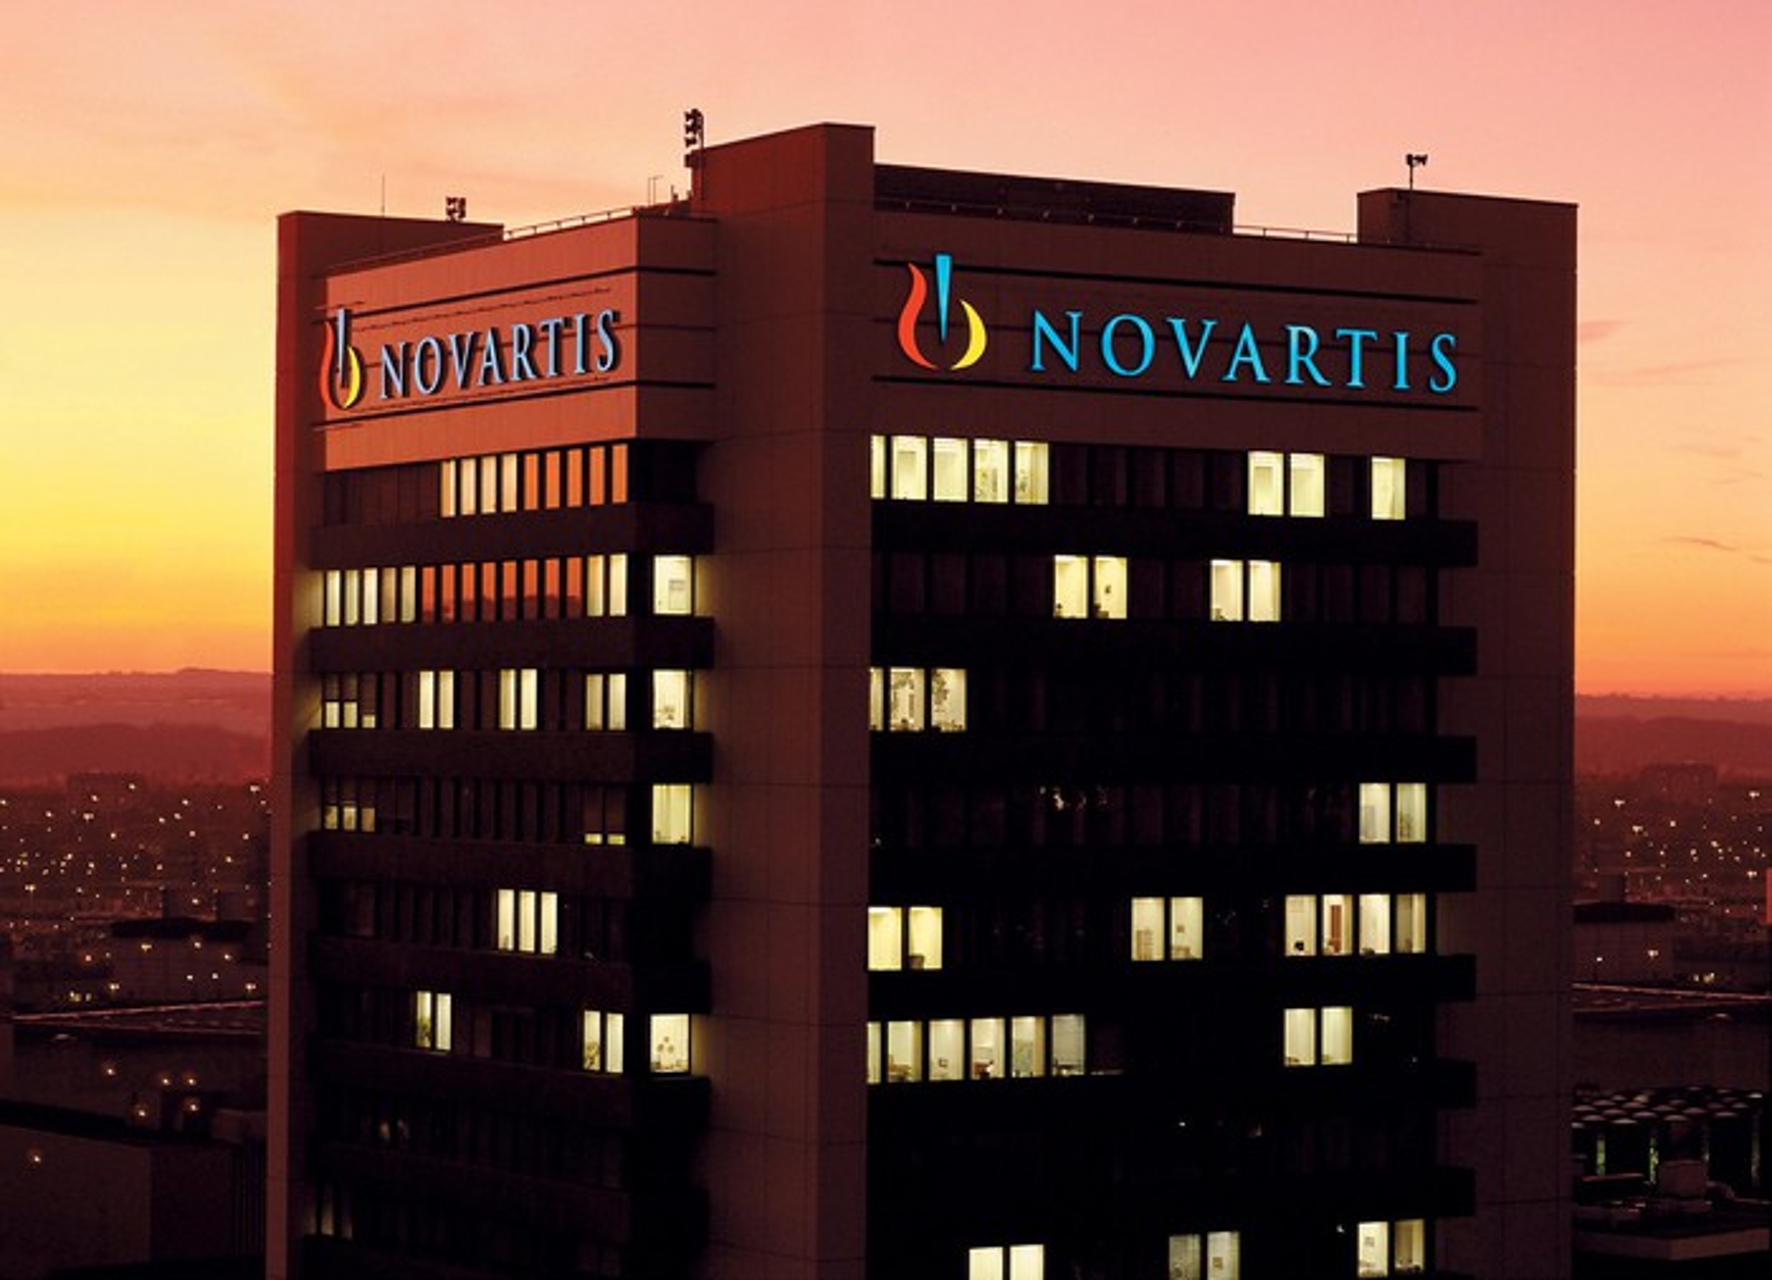 Novartis headquarters at sunset.